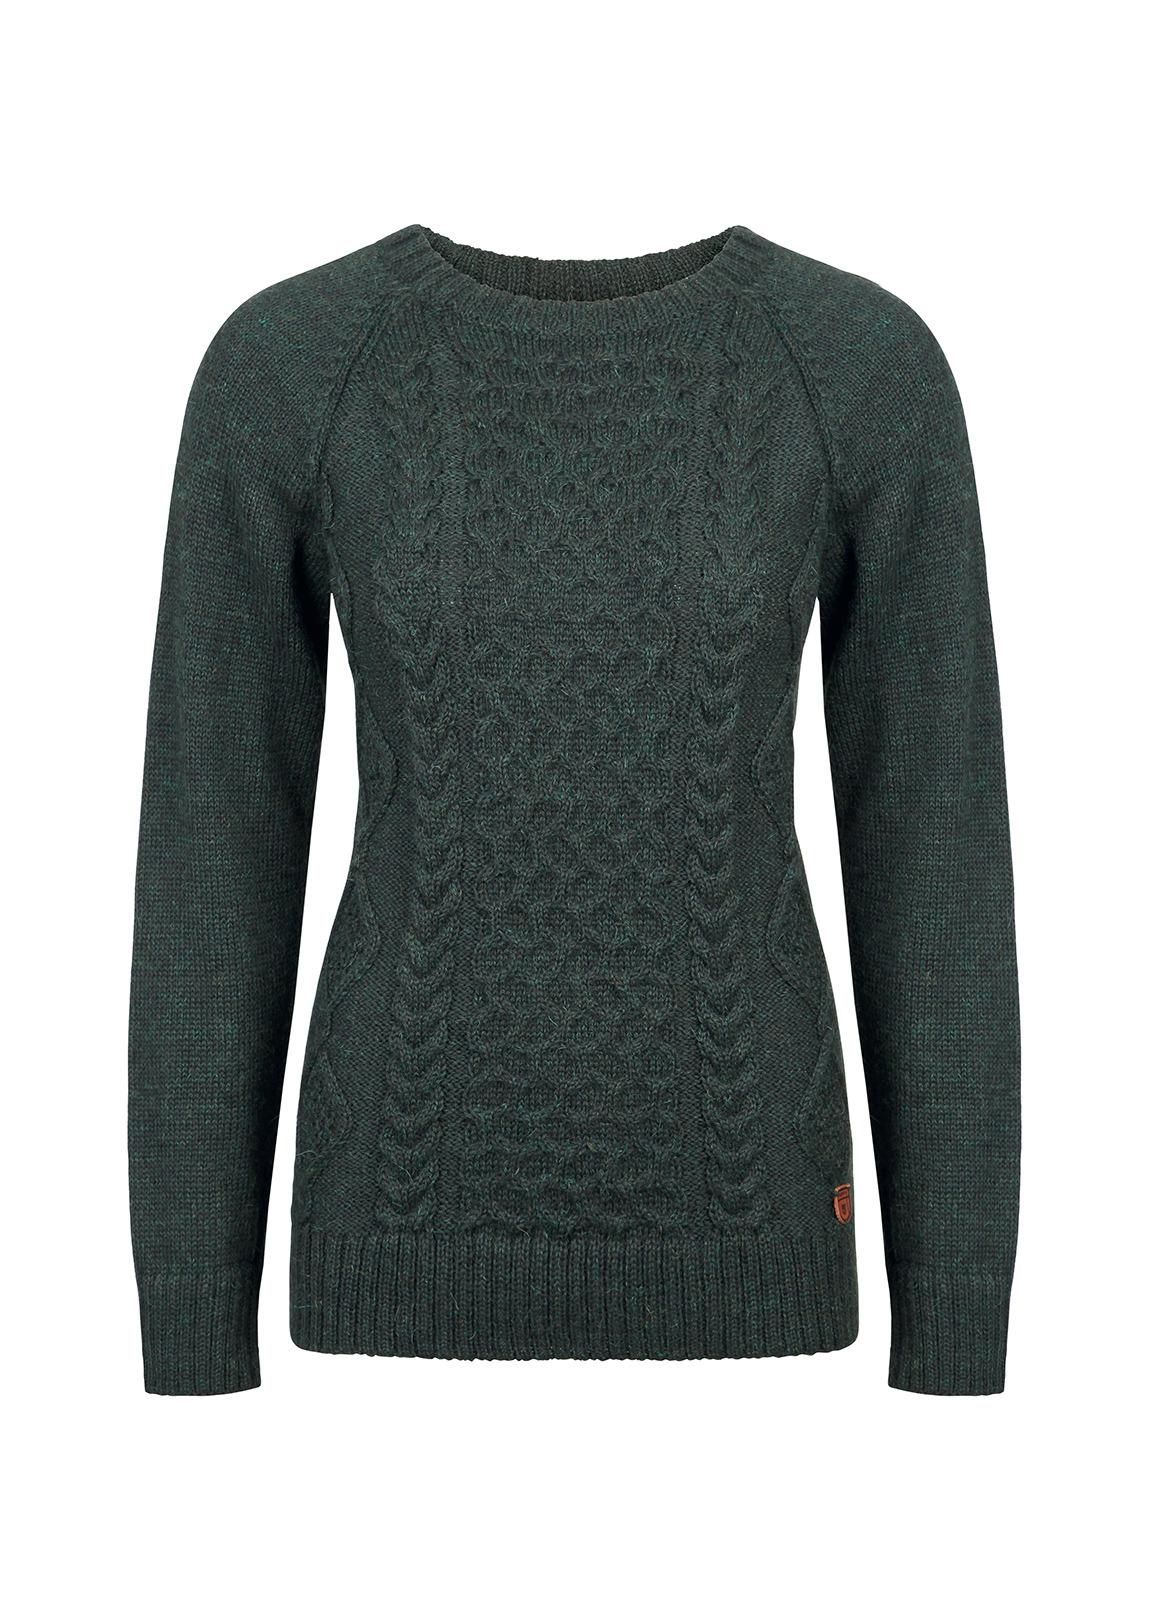 Dubarry_Shandon Ladies Cable Knit Sweater - Verdigris_Image_2